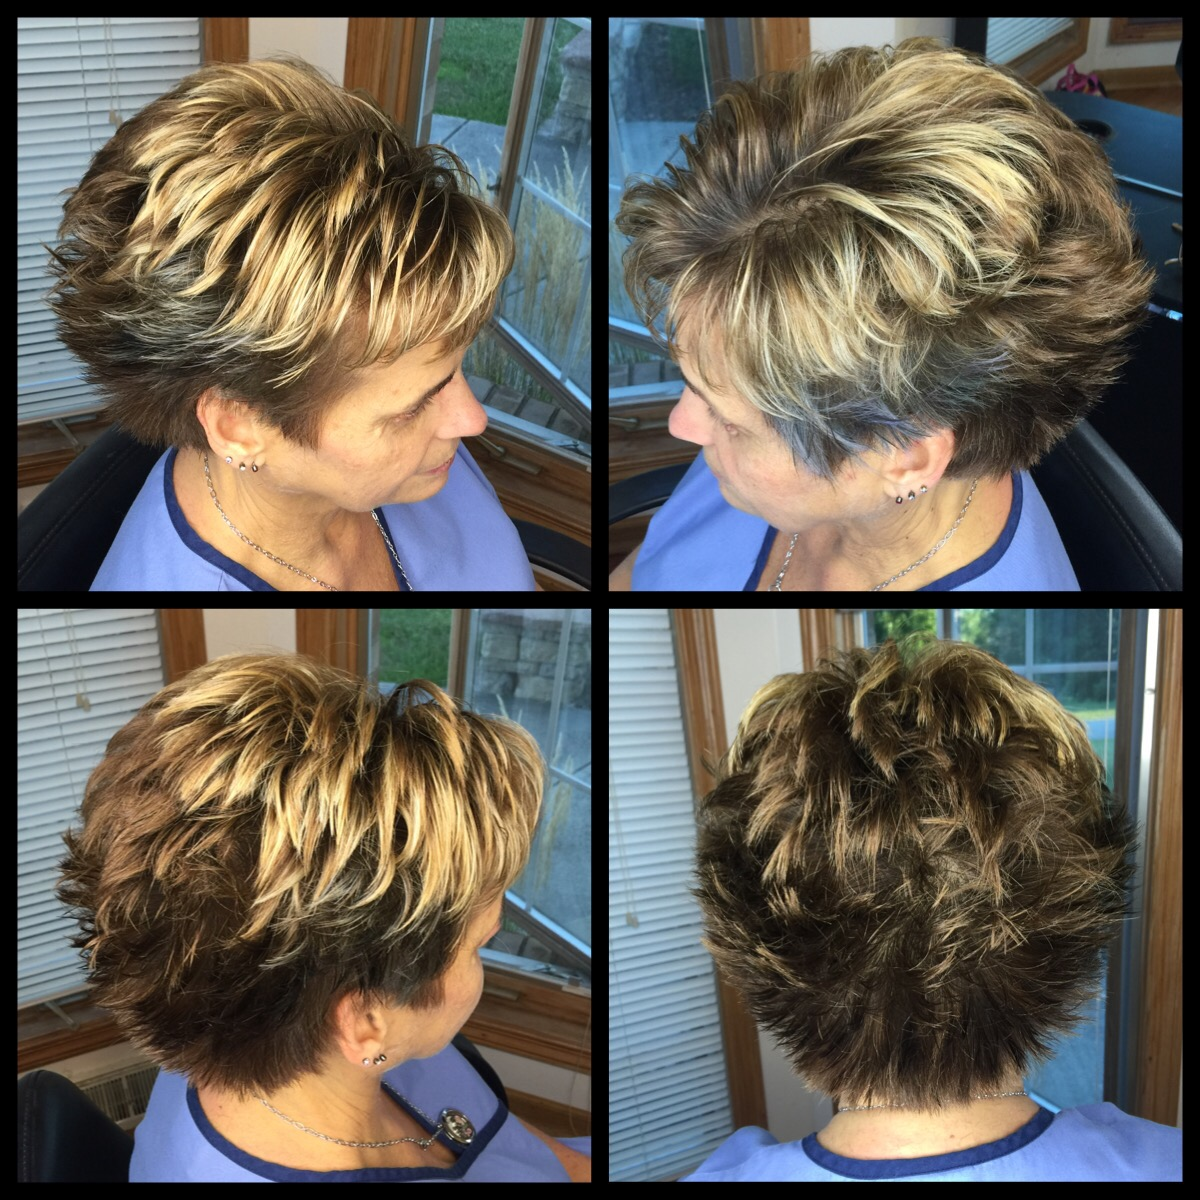 Short N Sassy Spikey Short Hair Cut In Light Chocolate